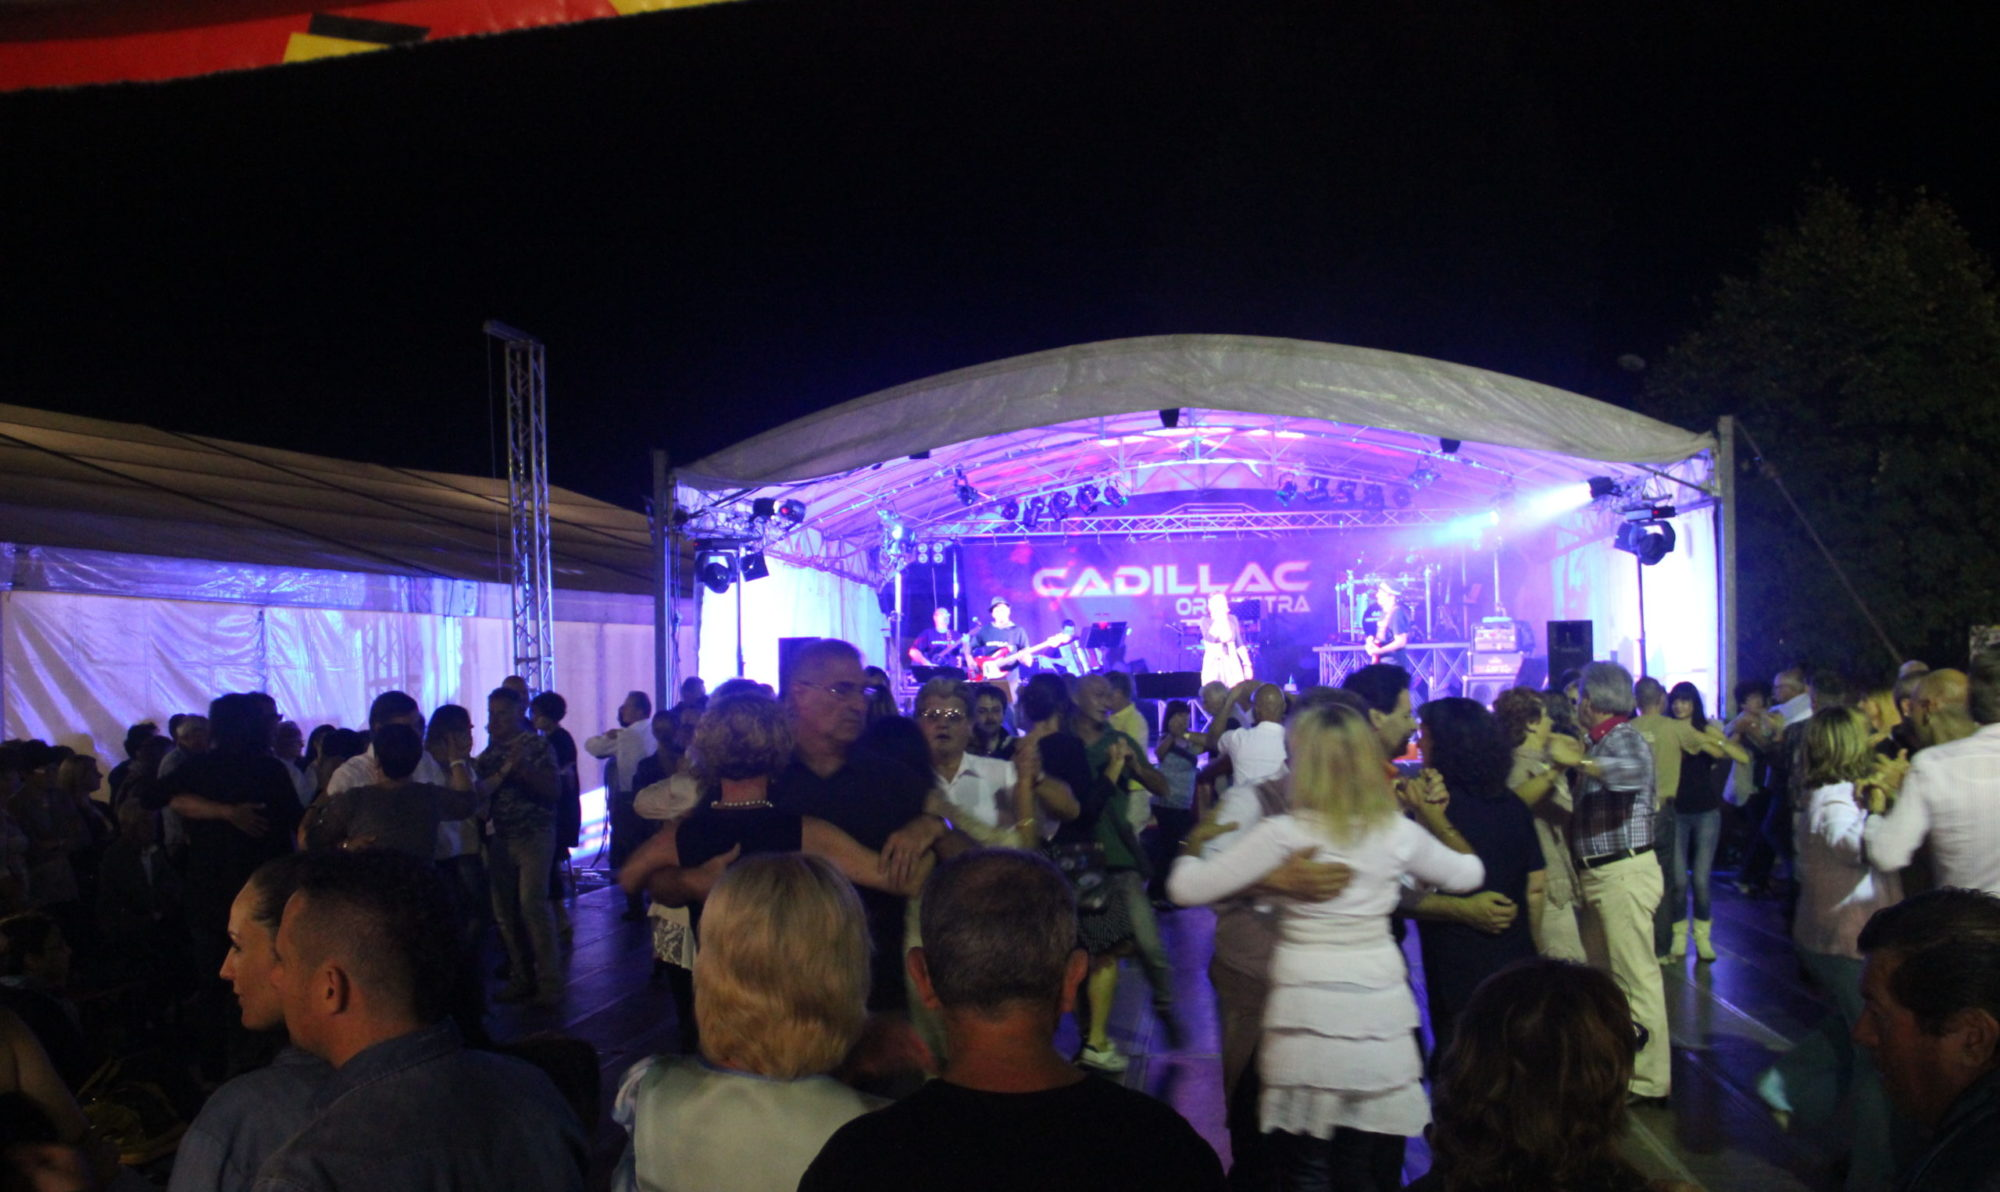 Orchestra Cadillac